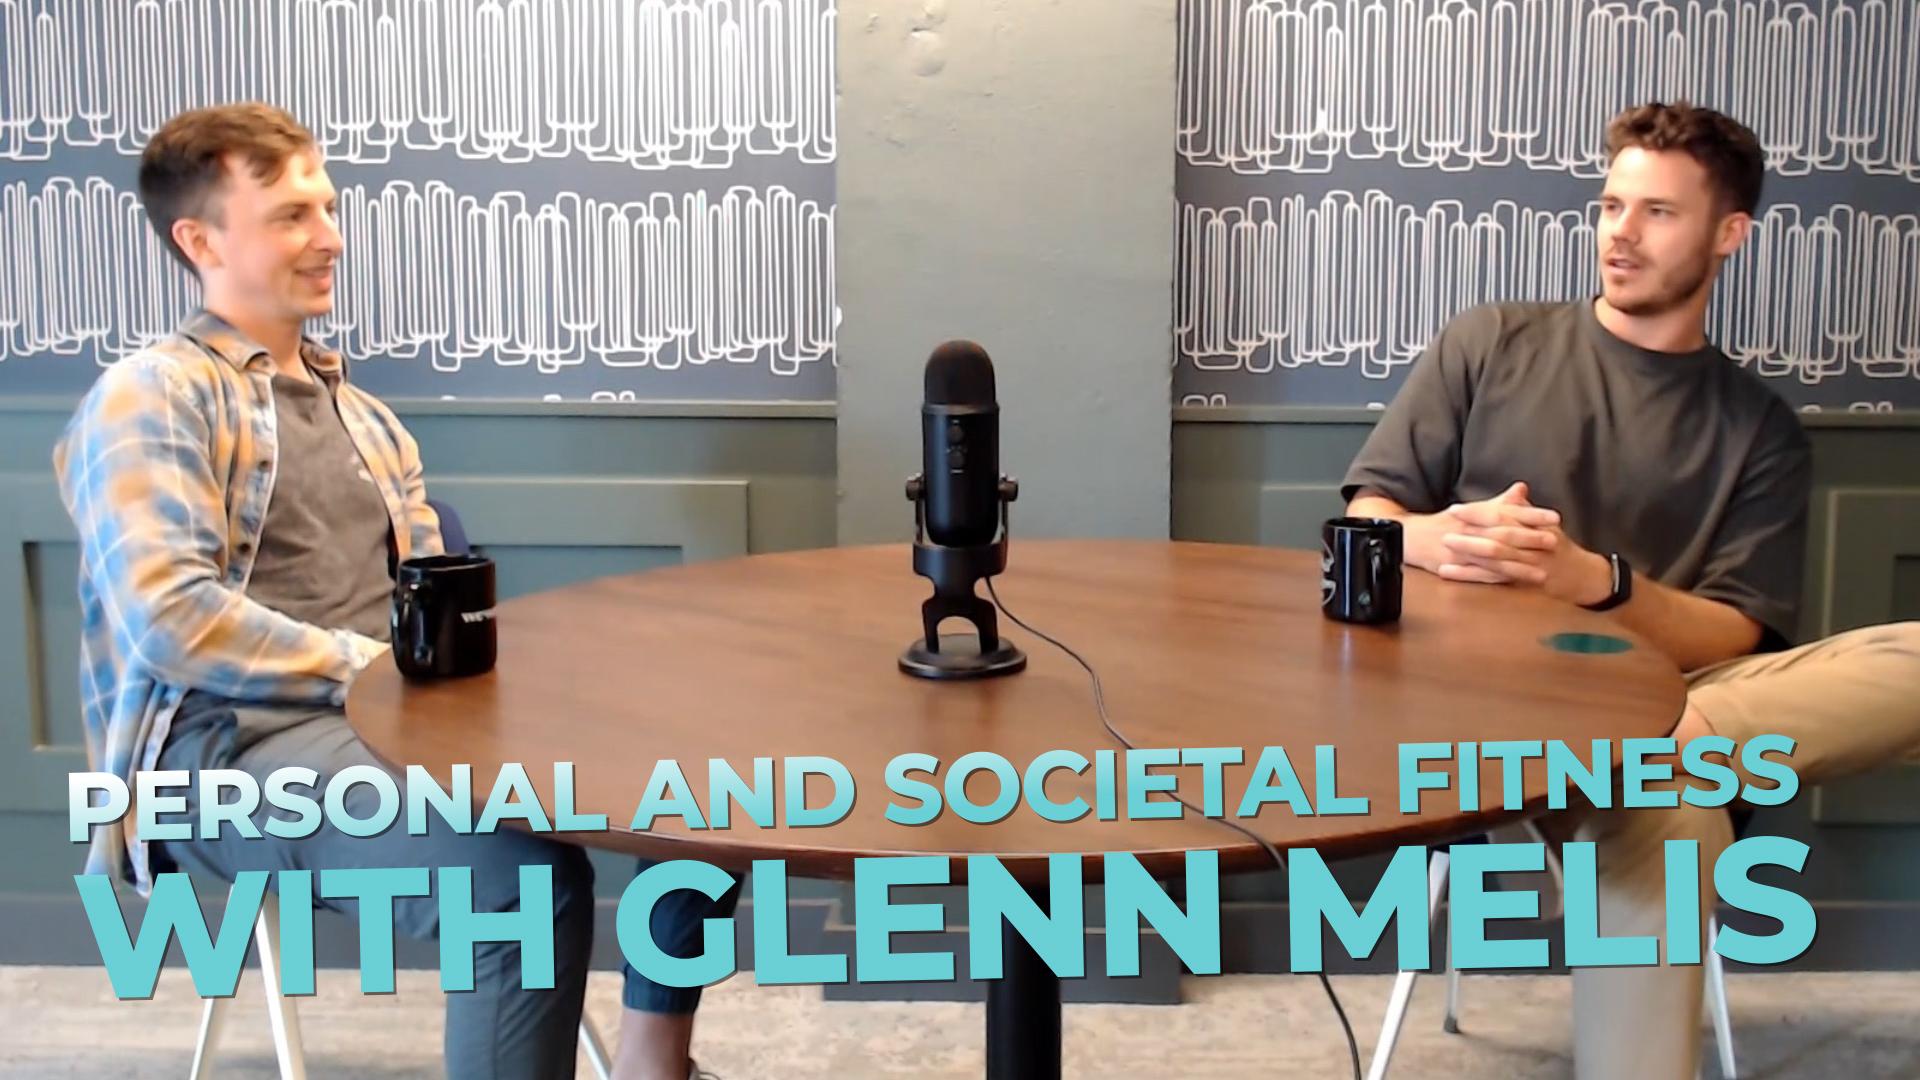 Personal and Societal Fitness with Glenn Melis Thumbnail